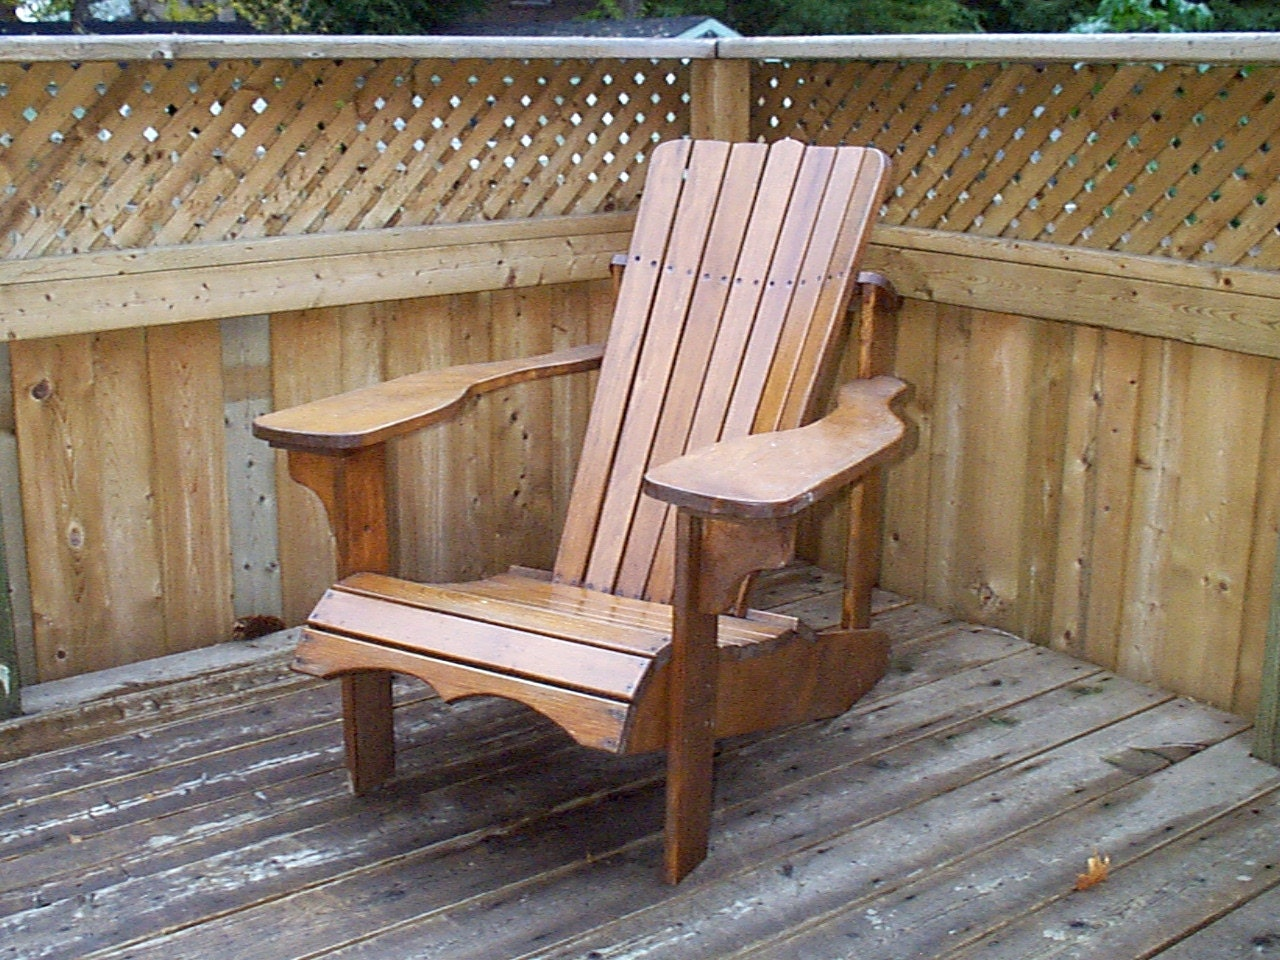 Mc1 Muskoka Adirondack Chair Plans Amp Full Size Patterns Pdf File Etsy From Evateakcanada On